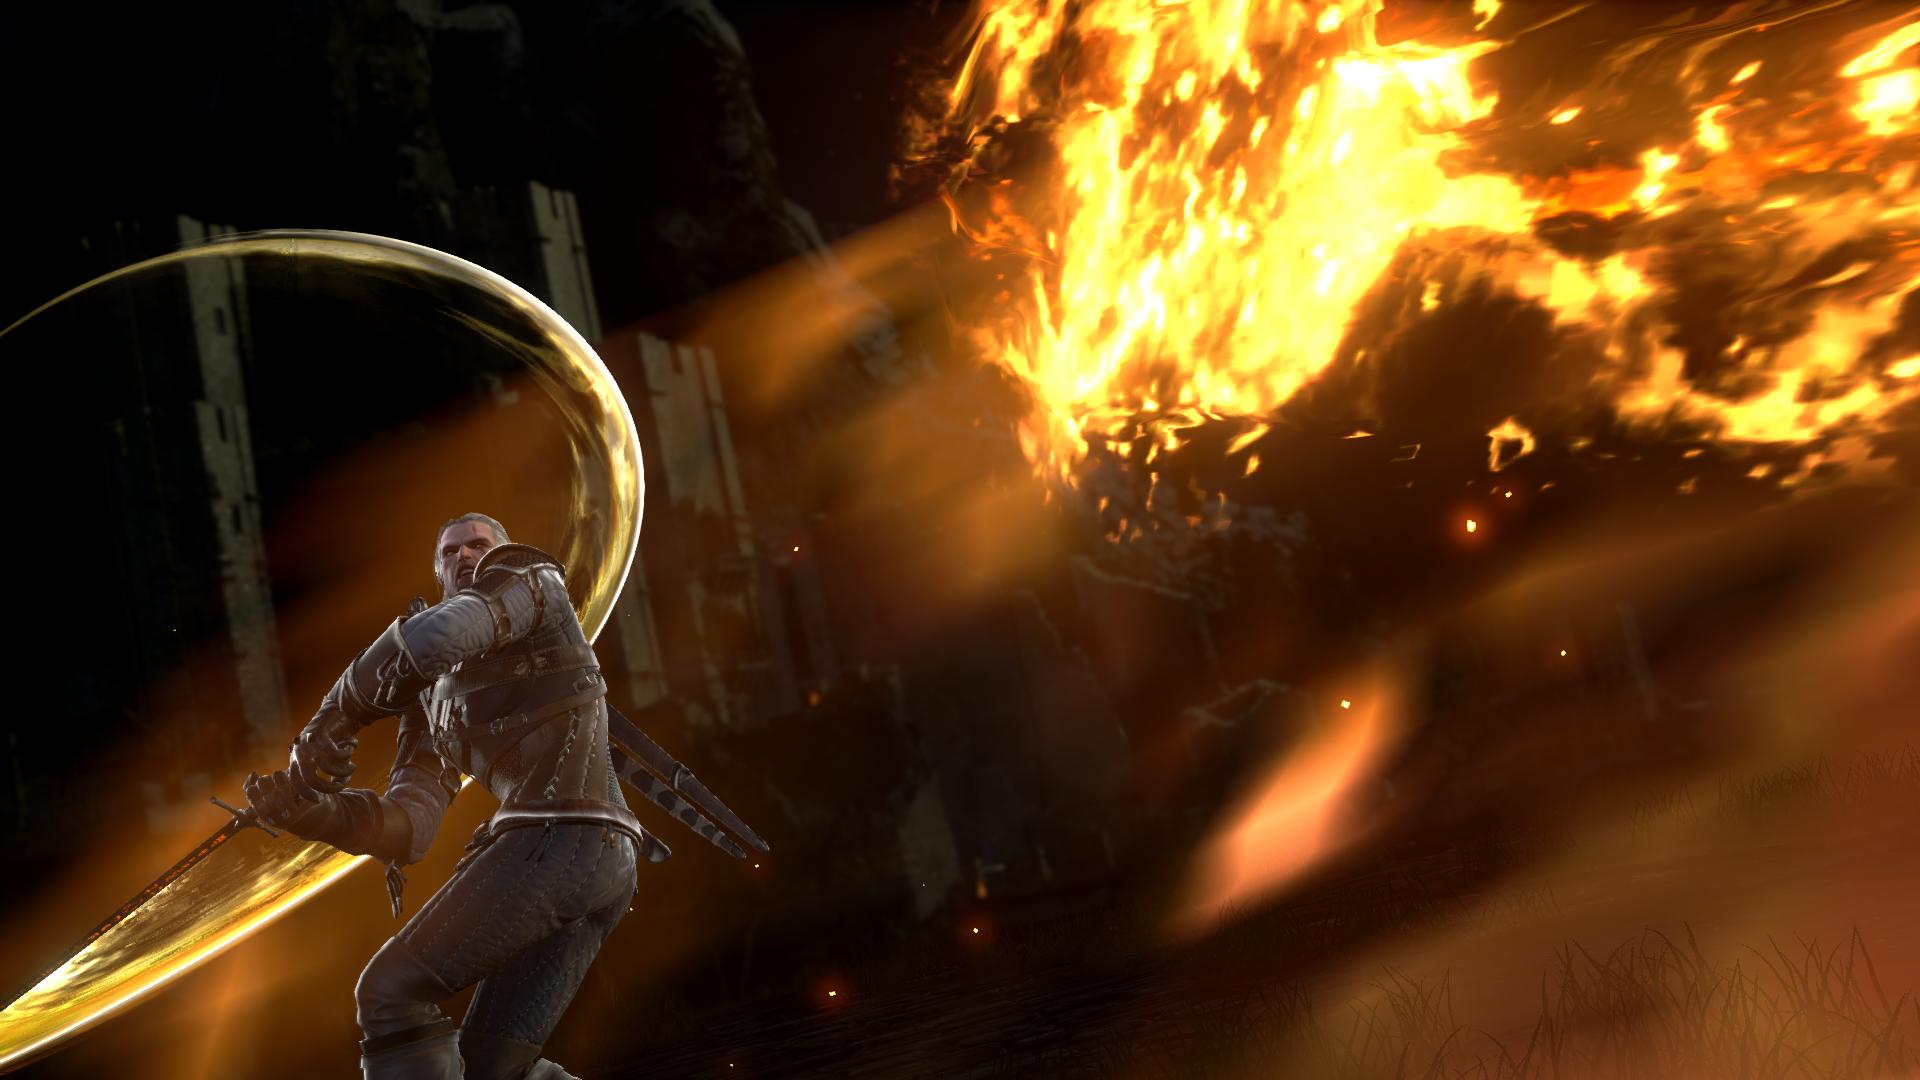 Geralt of Rivia coming to SoulCalibur 6